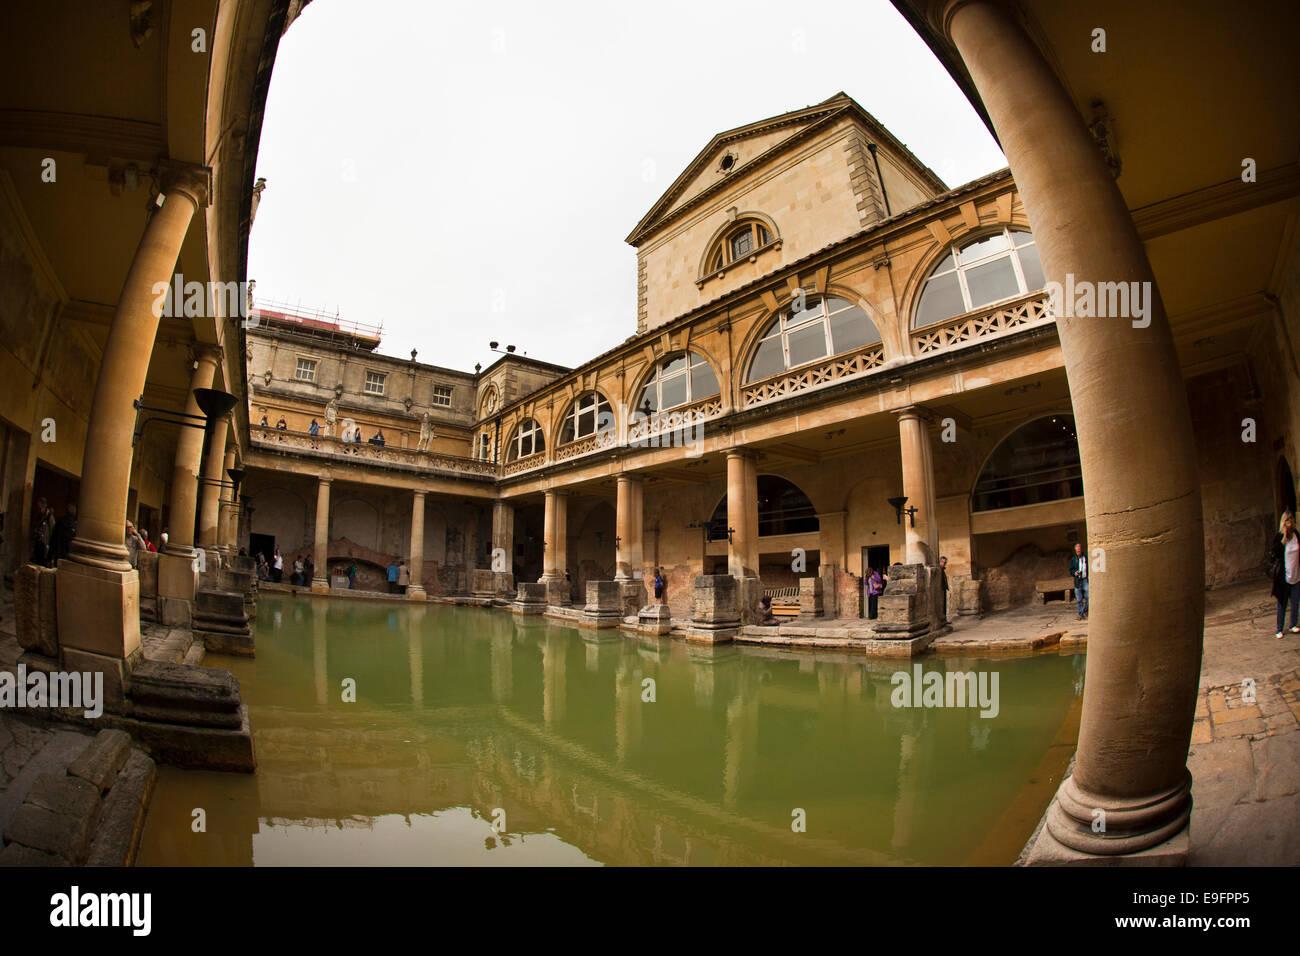 UK, England, Wiltshire, Bath, Roman Baths wide angle fisheye lens ...